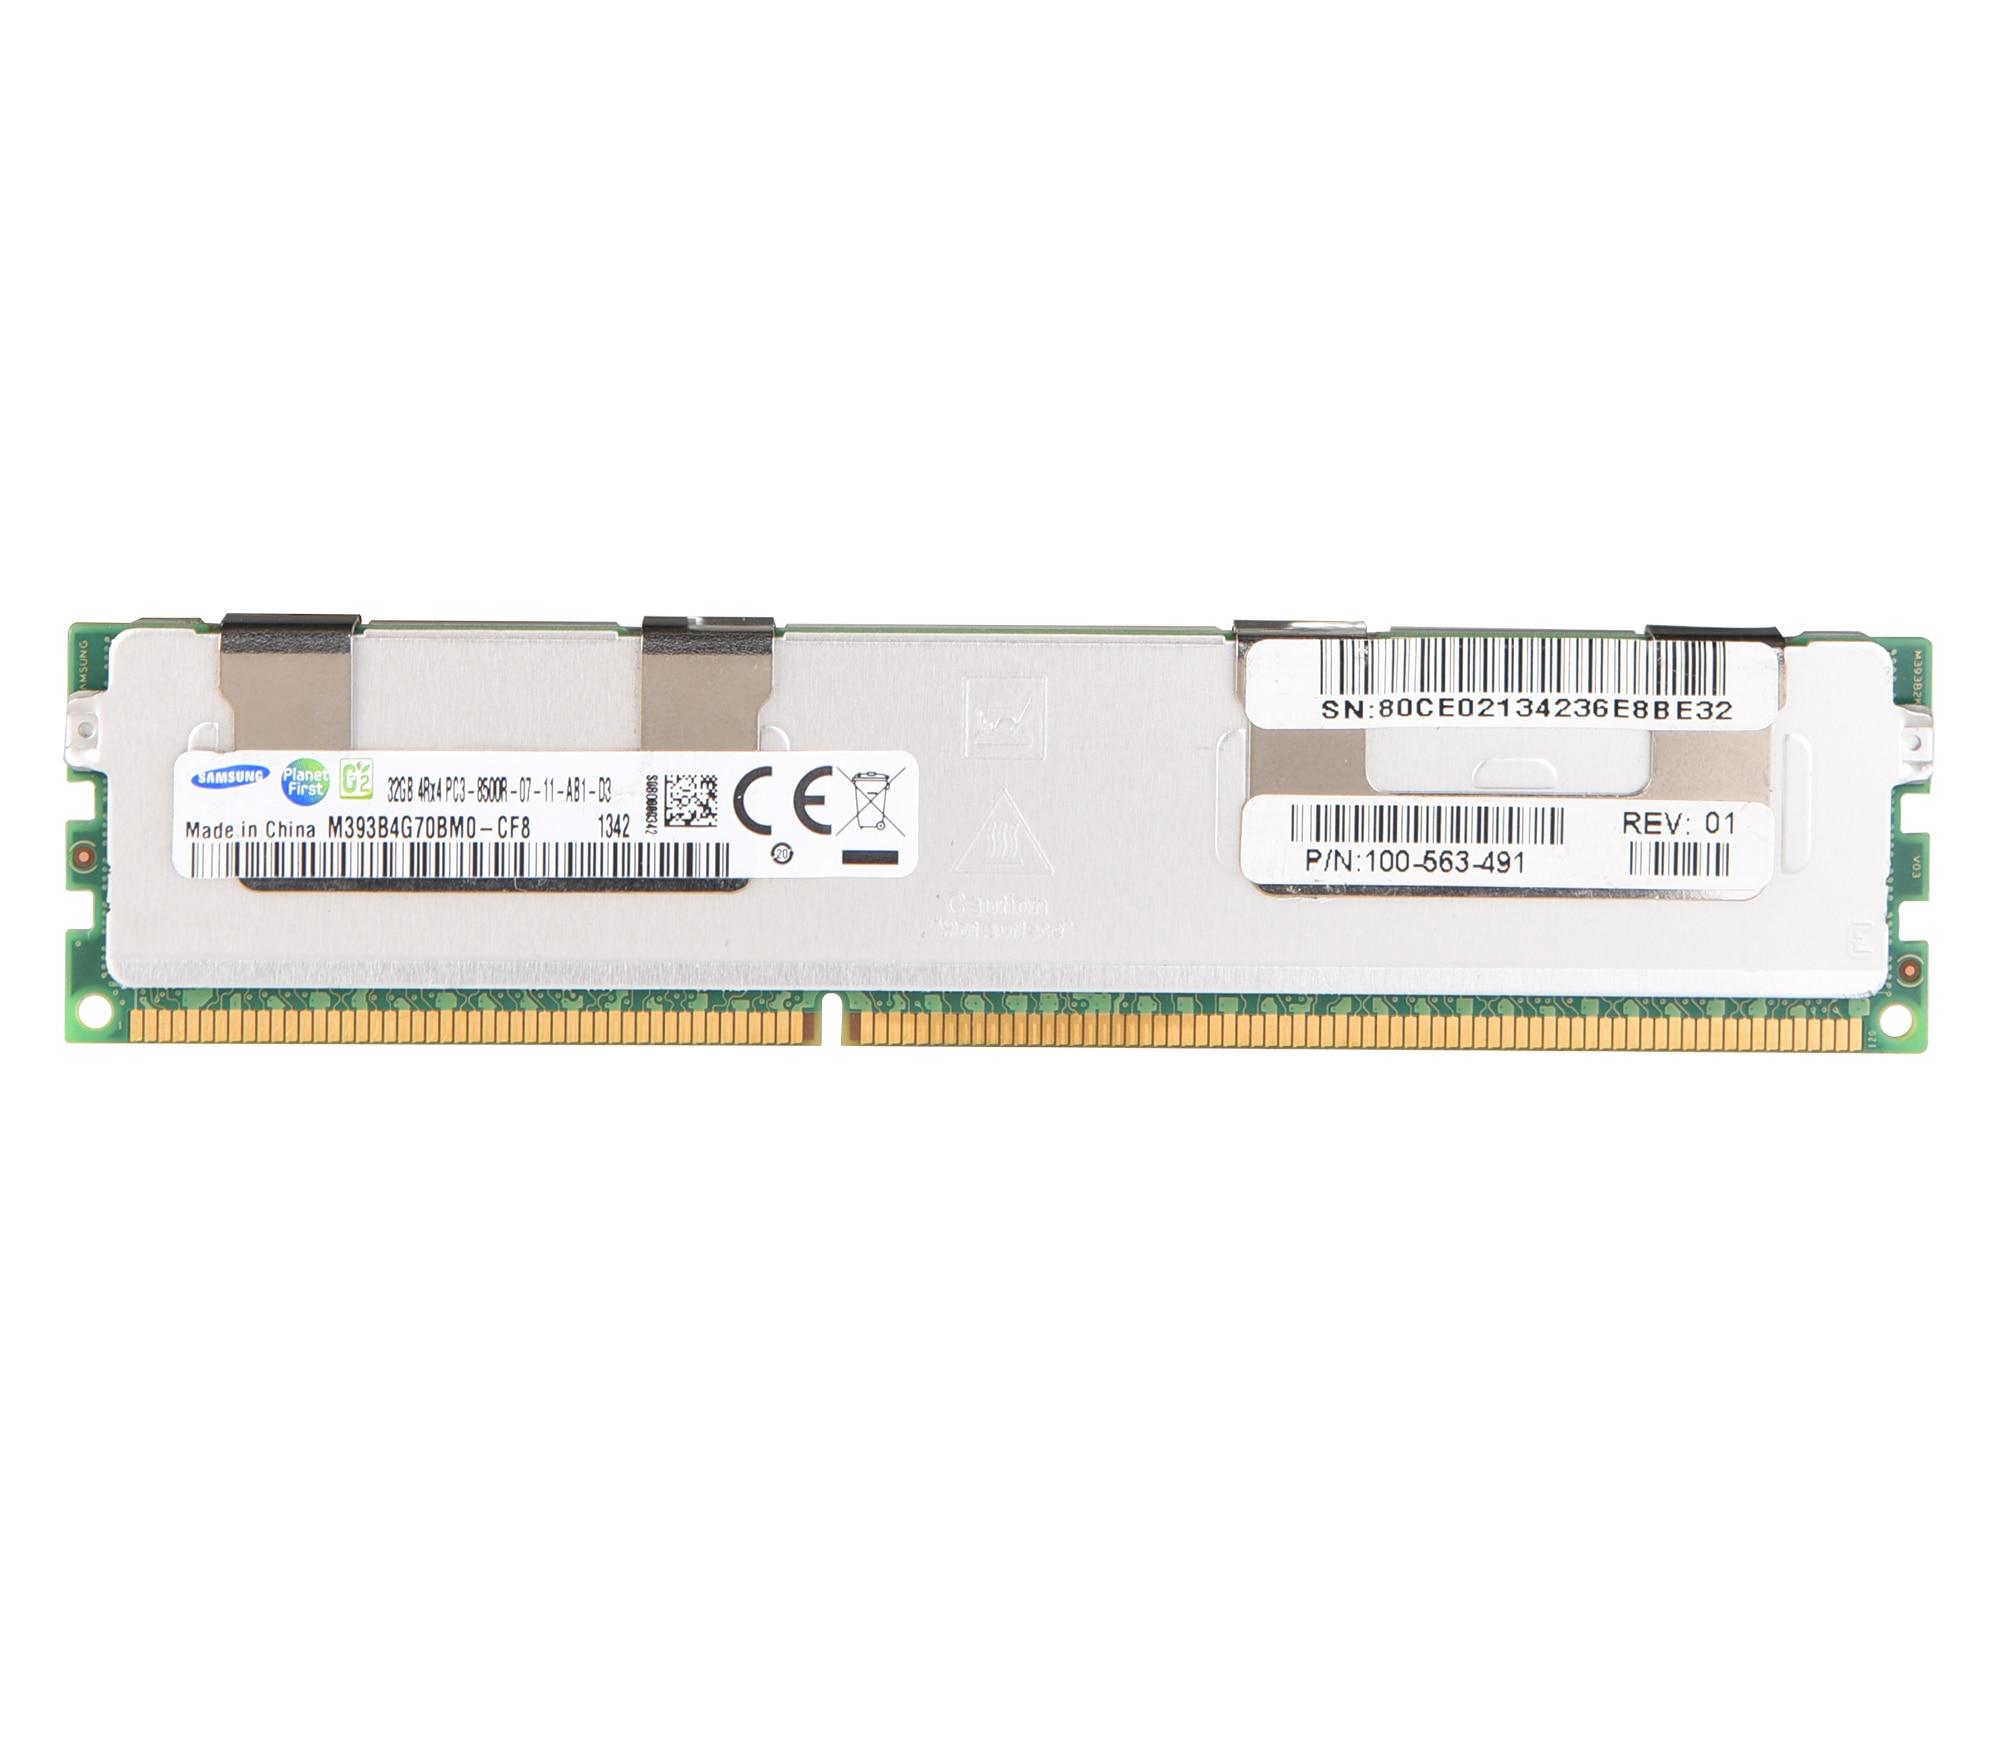 JINGSHA Supports X79 LGA 2011 Motherboard With DDR3 4GB 8GB 16GB 32GB  Ecc Reg Server Memory 1333 1600 1866MHz DIMM  RAM